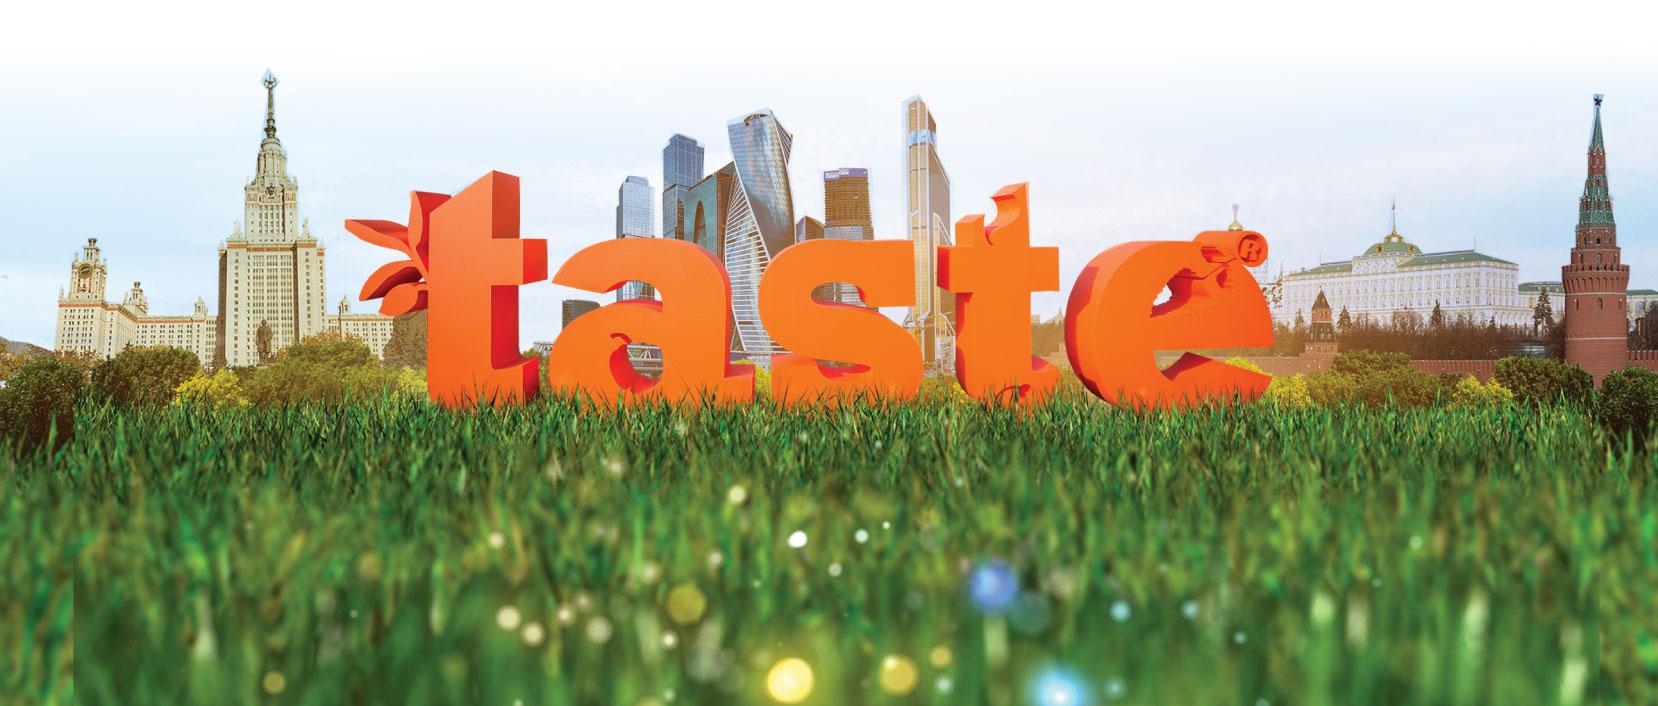 Taste2017_footer_OK